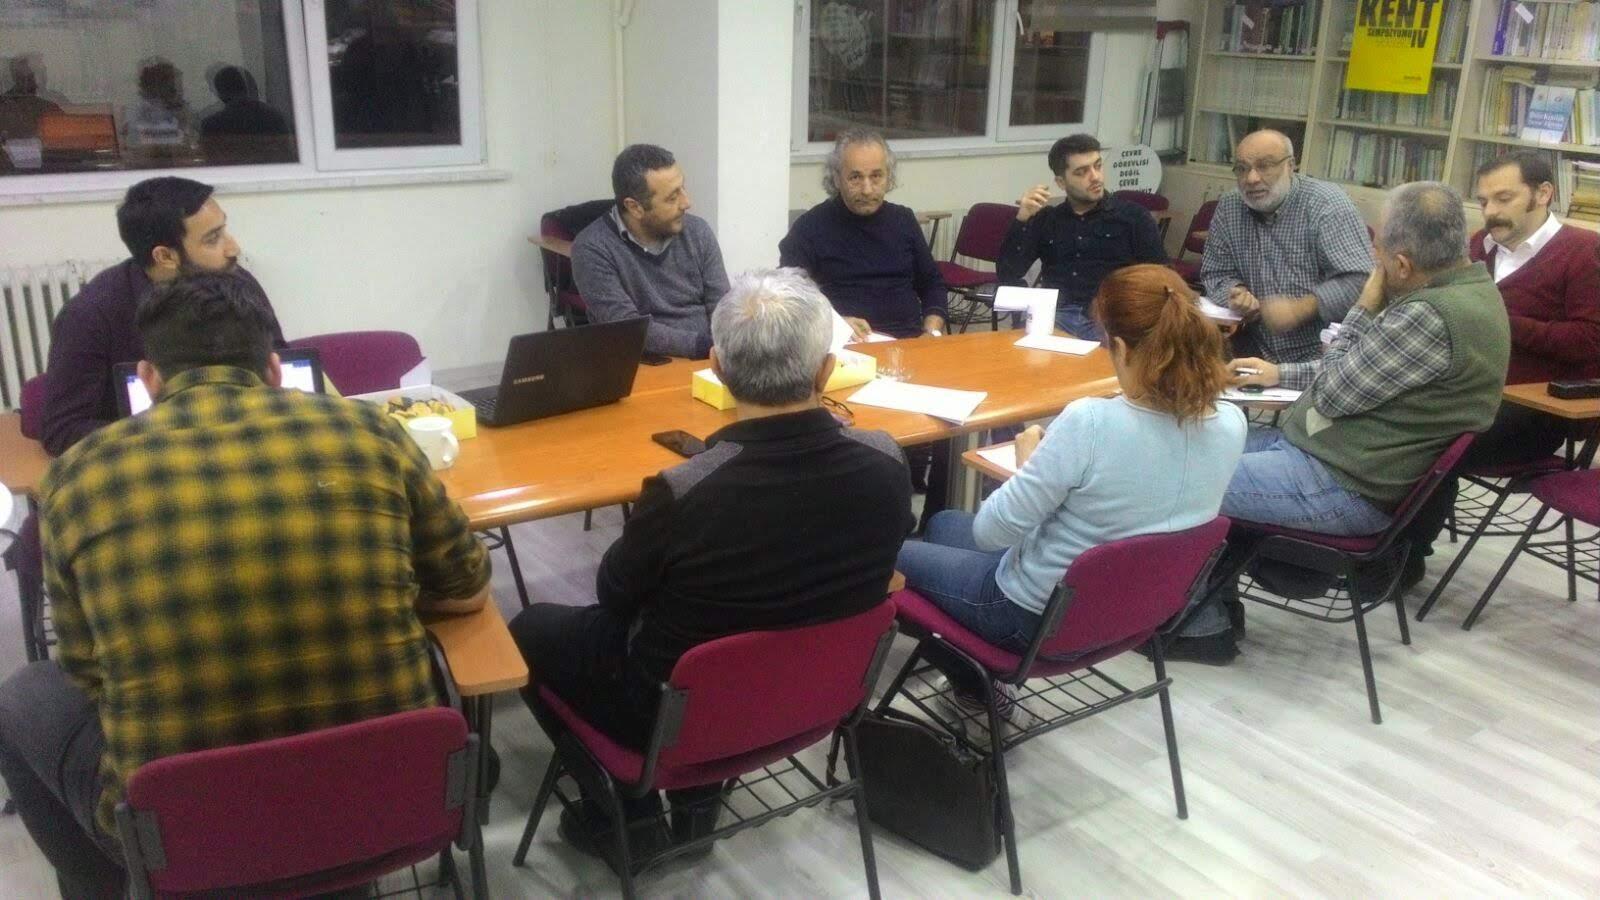 TMMOB İstanbul İl Koordinasyon Kurulu Kanal İstanbul Çalışma Grubu Kuruldu